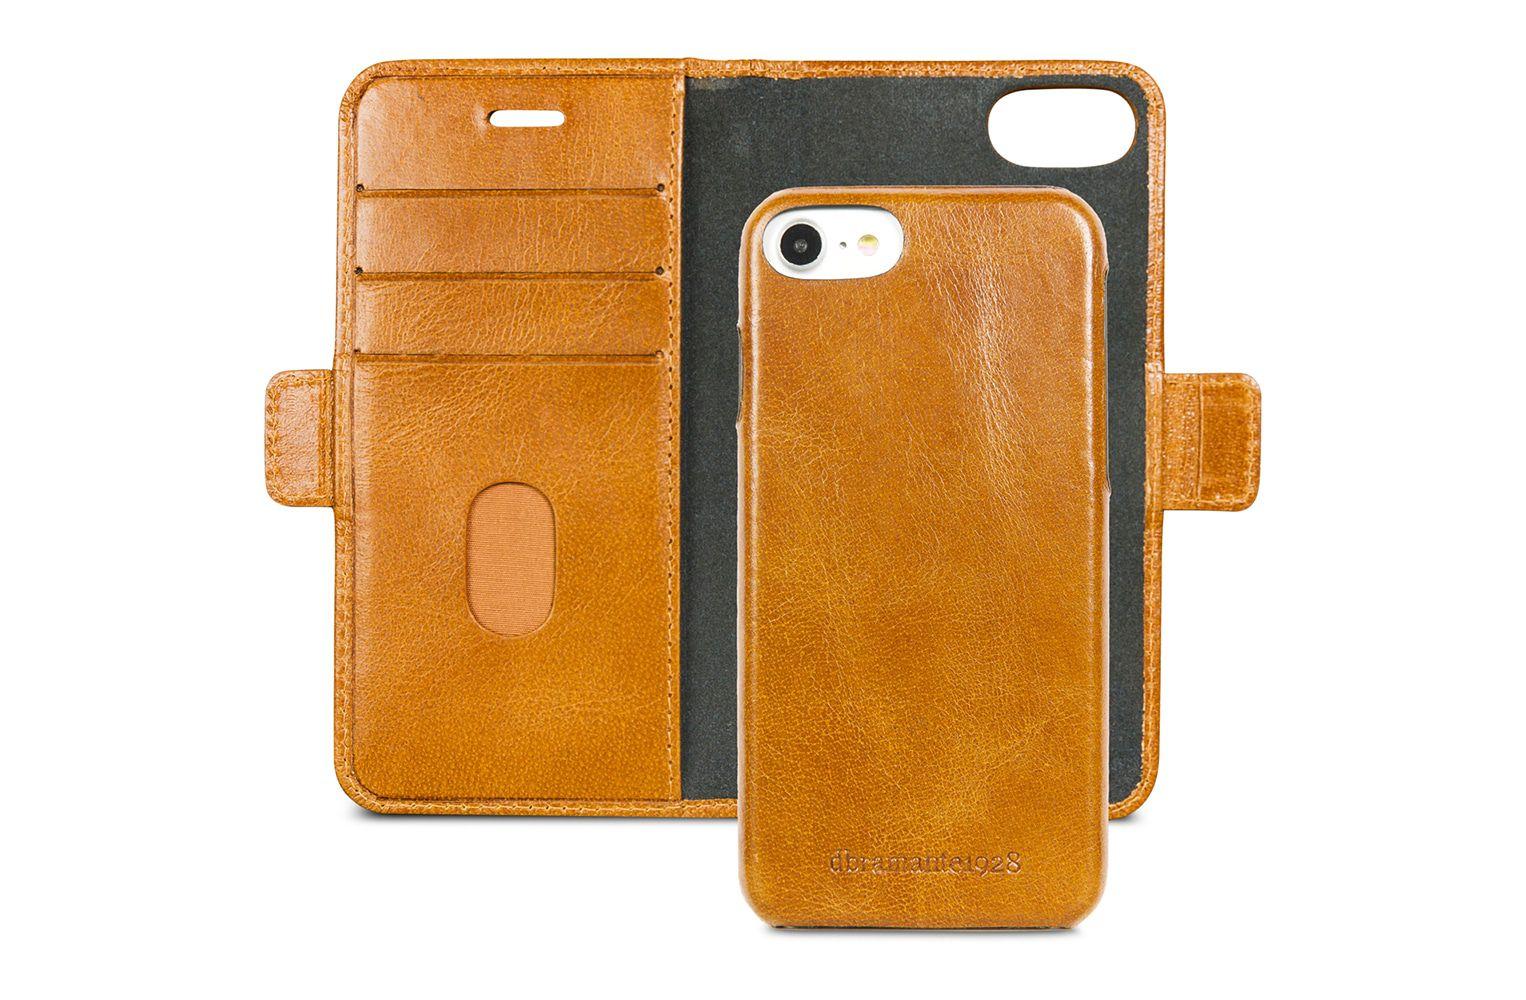 dbramante1928 Lynge Leather Wallet iPhone 8/7/6 Series Tan